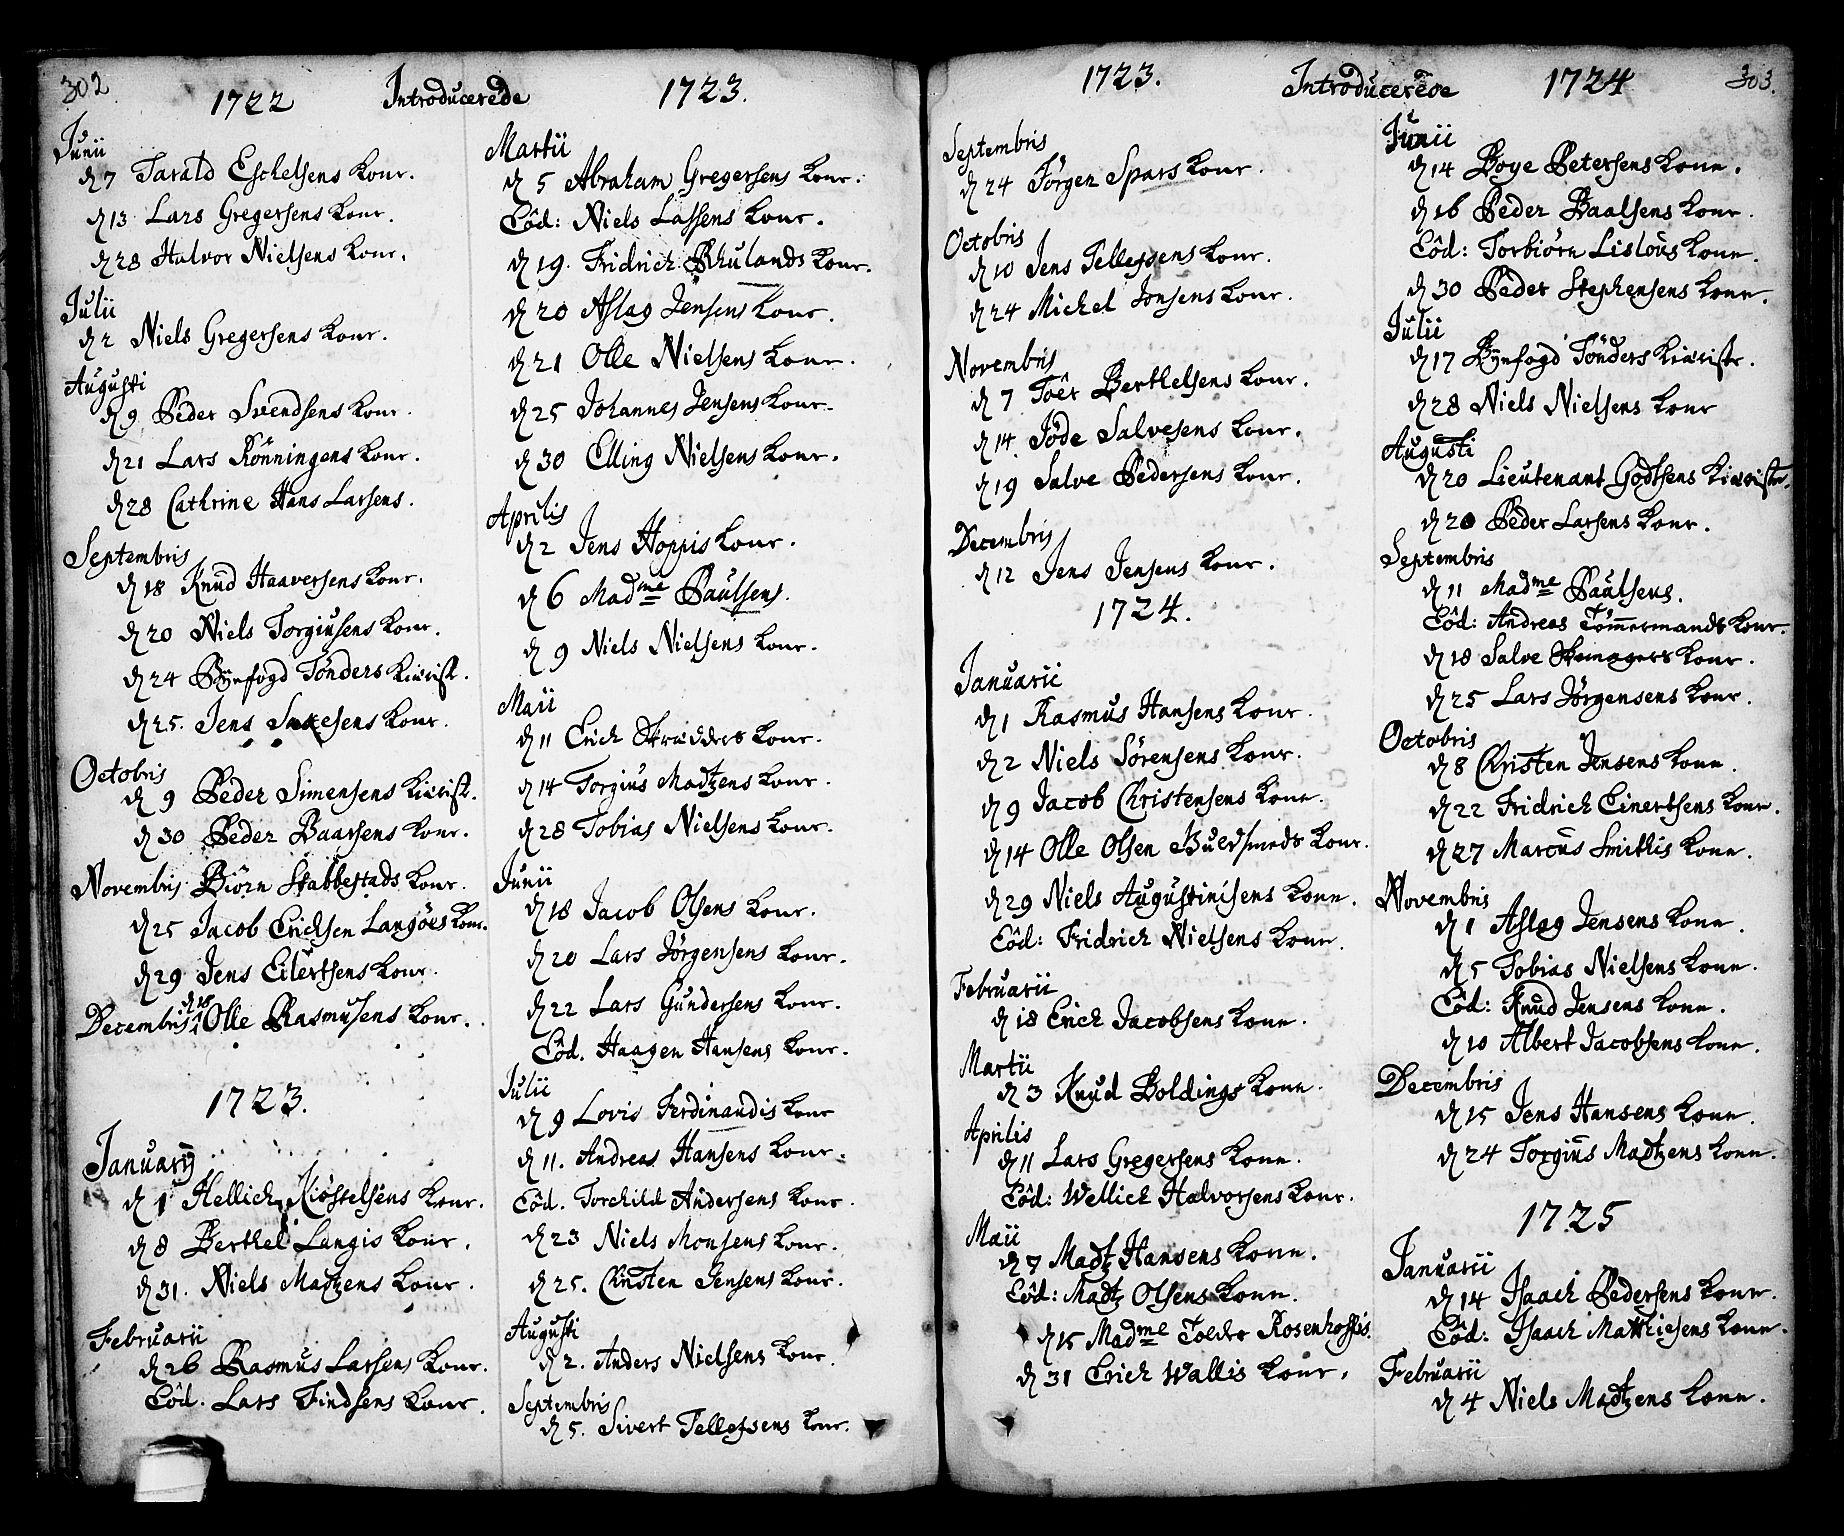 SAKO, Kragerø kirkebøker, F/Fa/L0001: Ministerialbok nr. 1, 1702-1766, s. 302-303